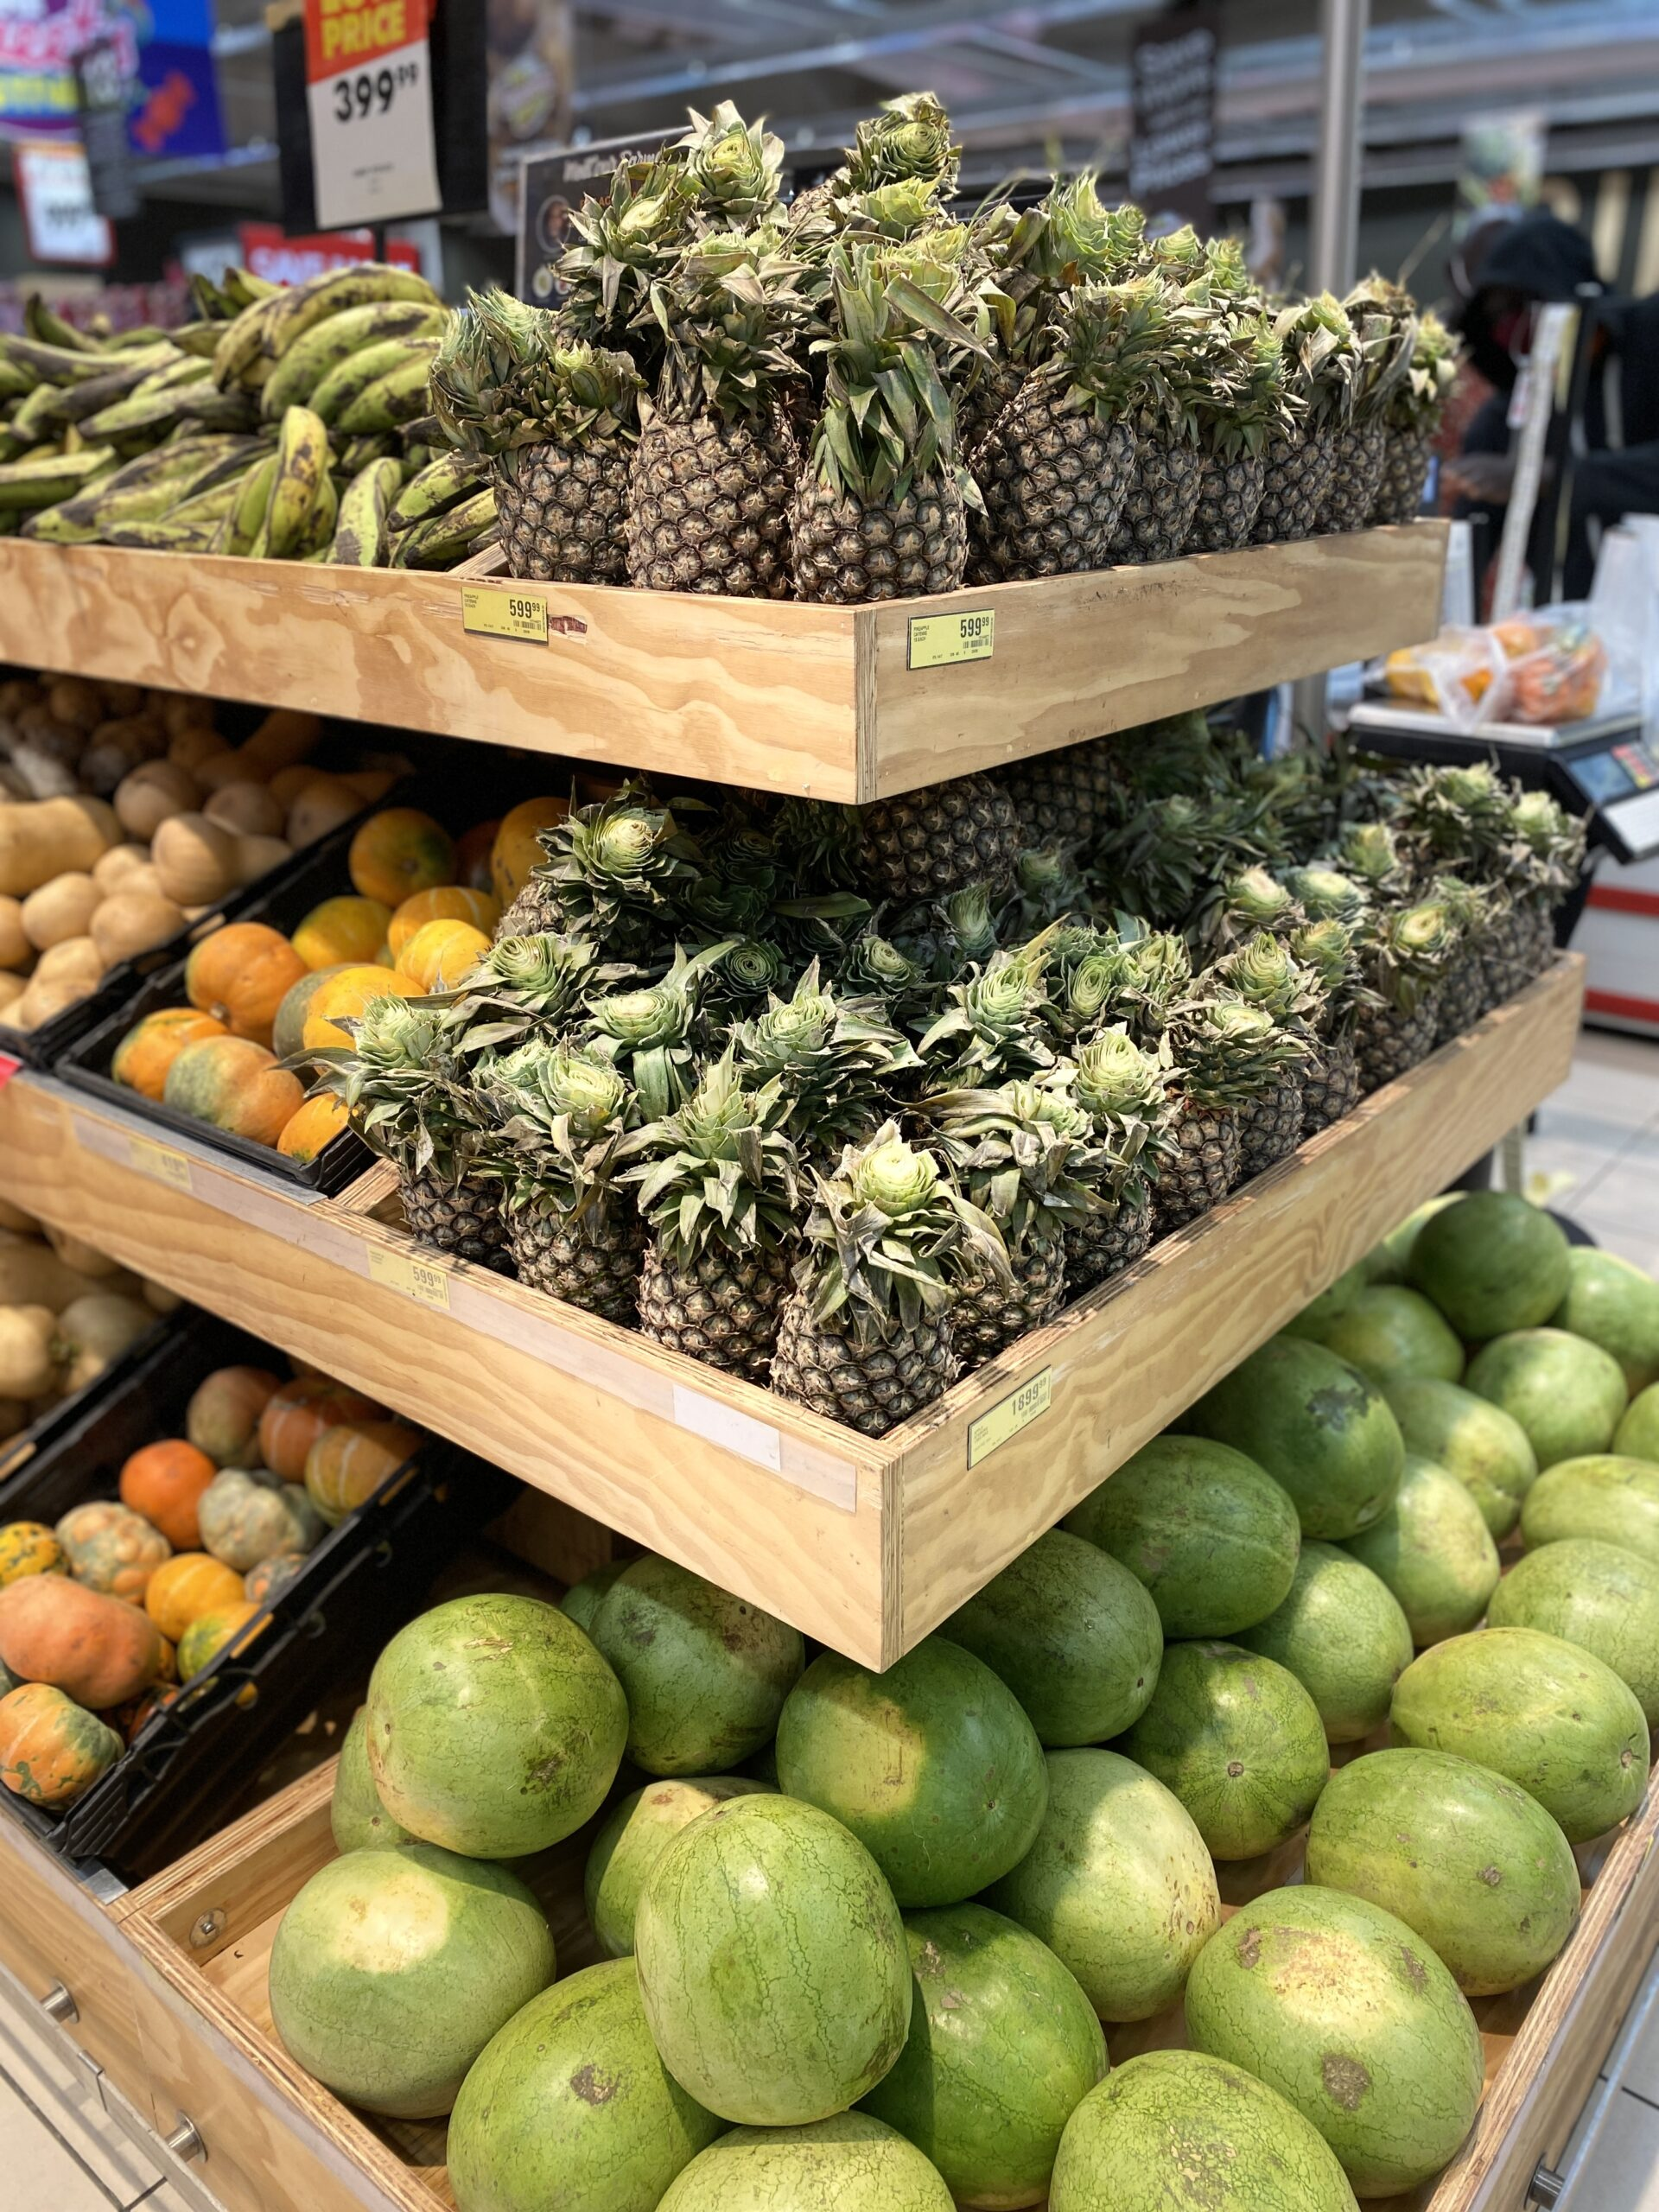 SHOPRITE Farm Customers meet farmers supplying Shoprite store farm-fresh produce Brandspurng